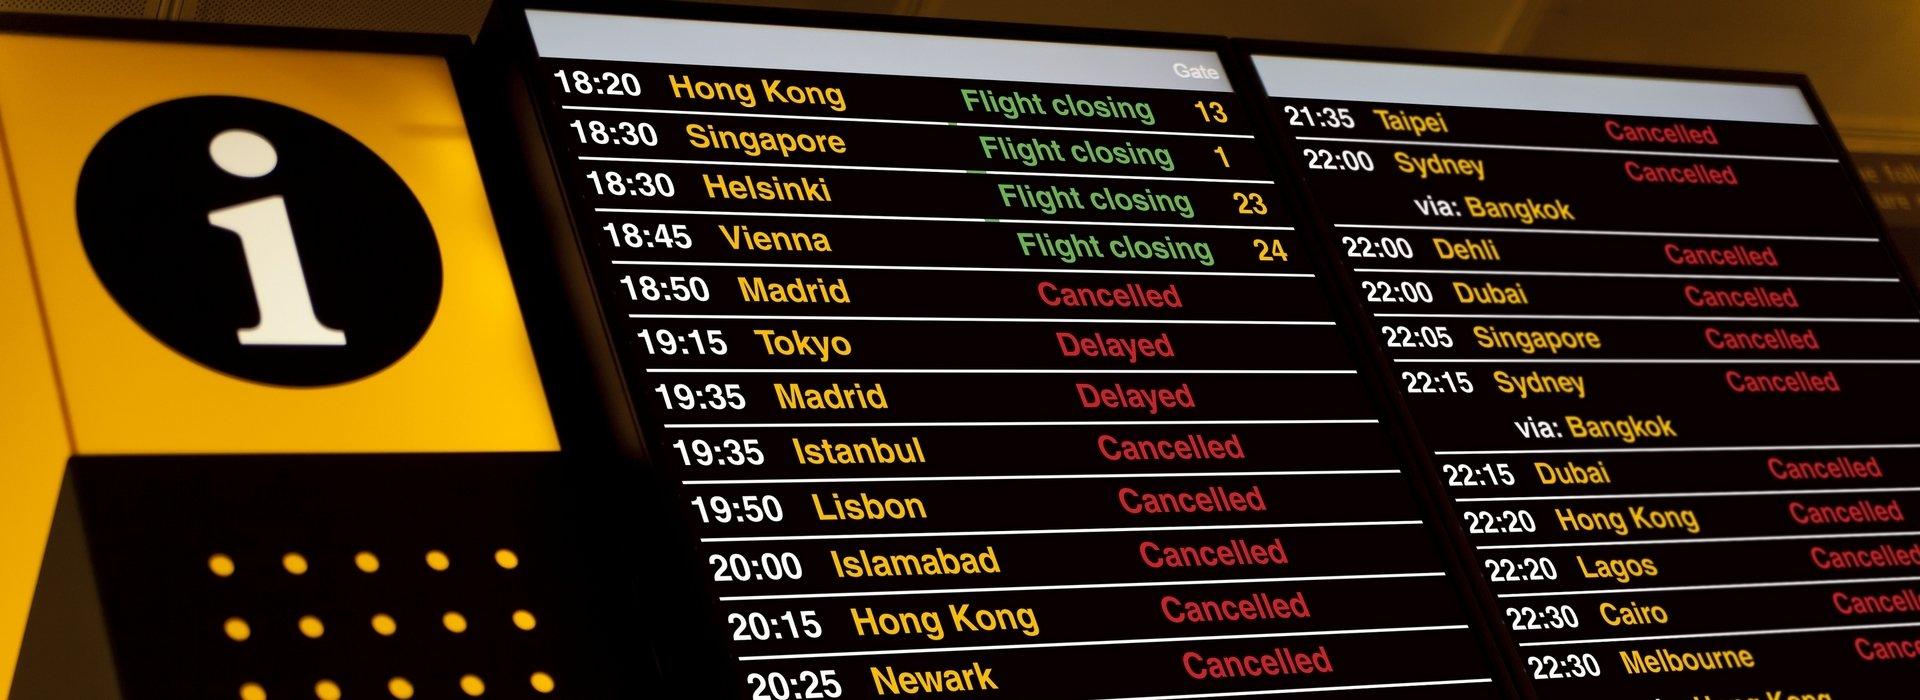 Turista információk